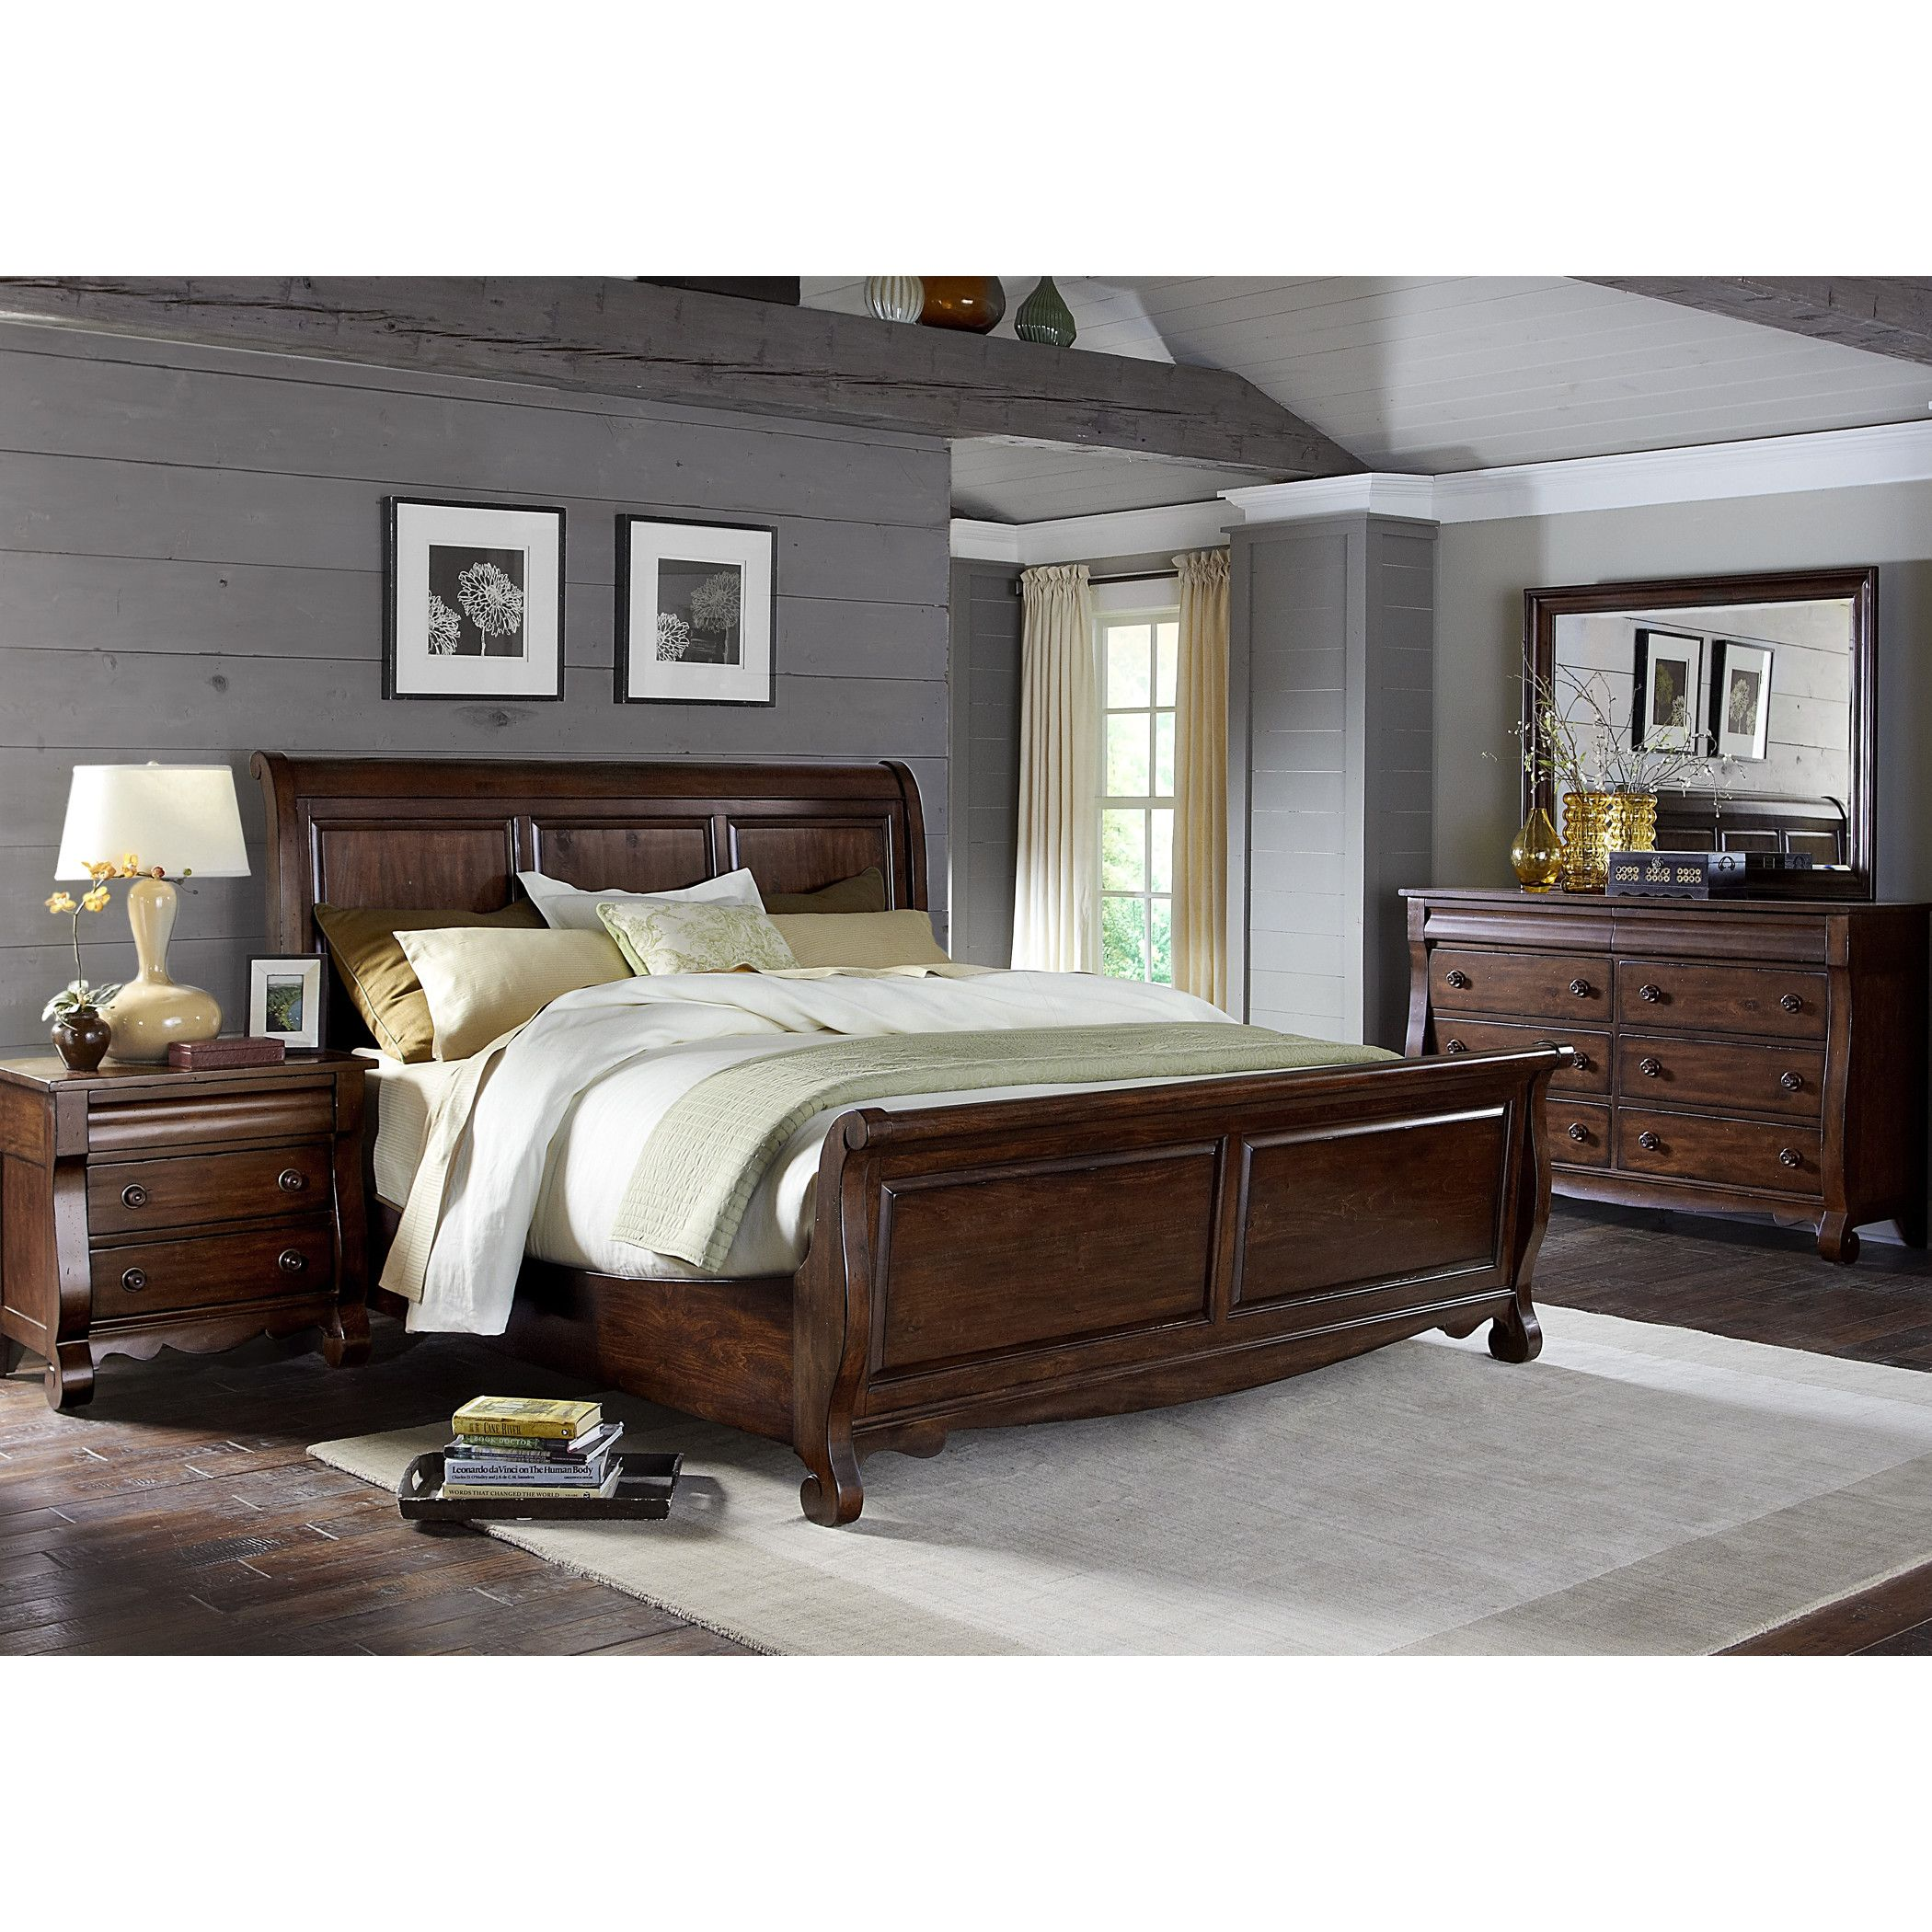 Brown Furniture Bedroom, Broyhill